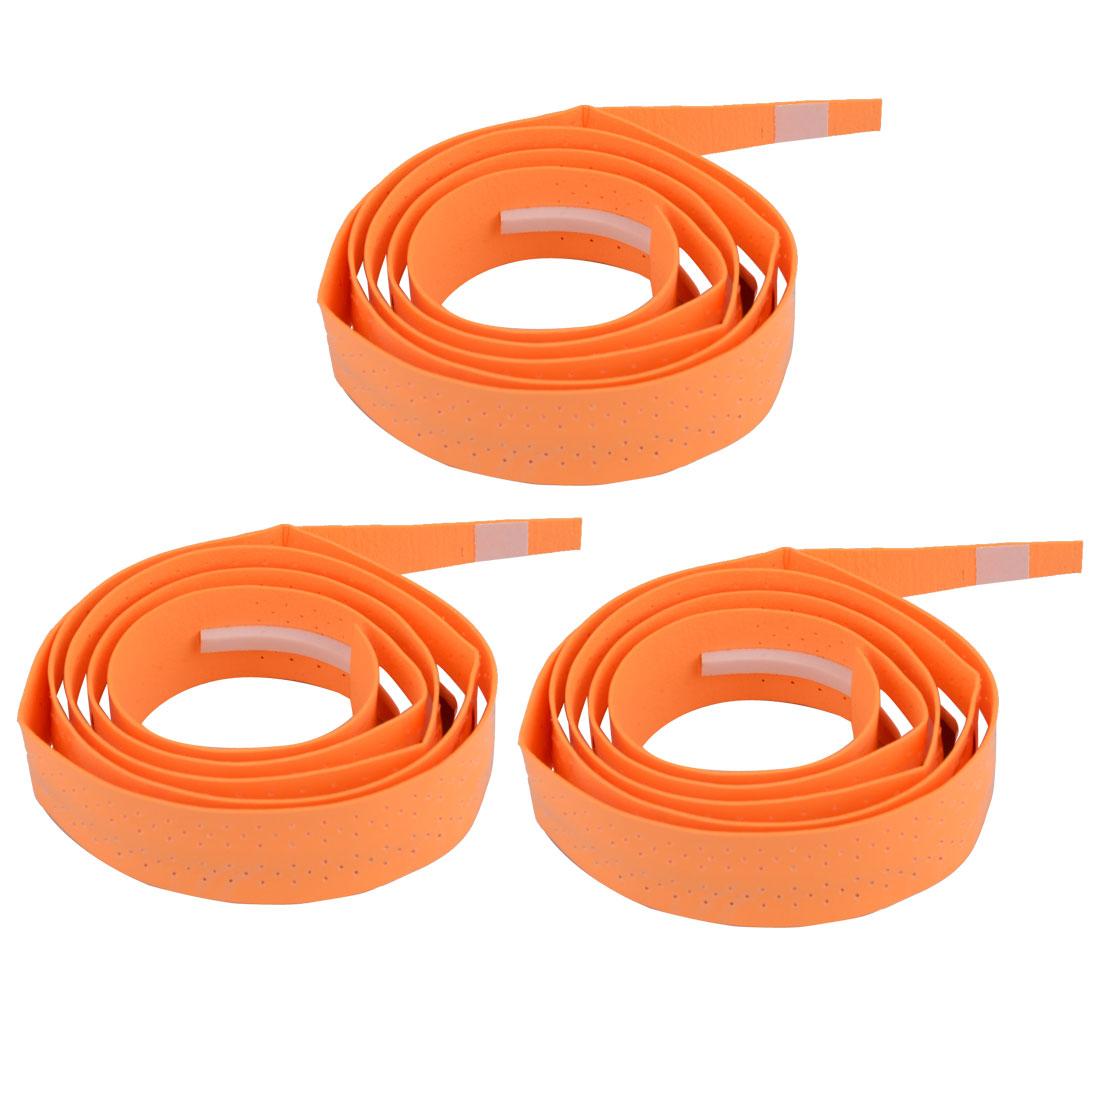 Badminton Foam Nonslip Racket Handle Sweat Absorbing Wrap Over Grip Tape Orange 3 Pcs